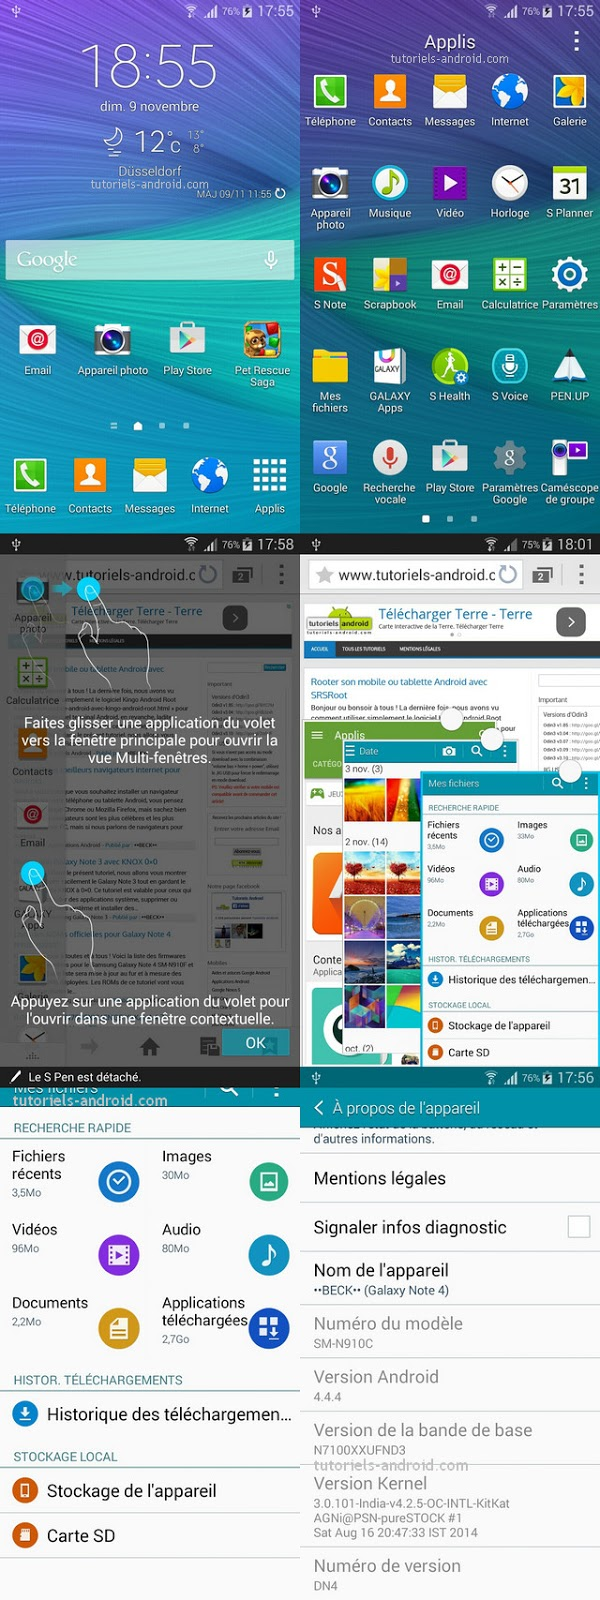 Screenshot - DN4 Android 4.4.4 GT-N7100